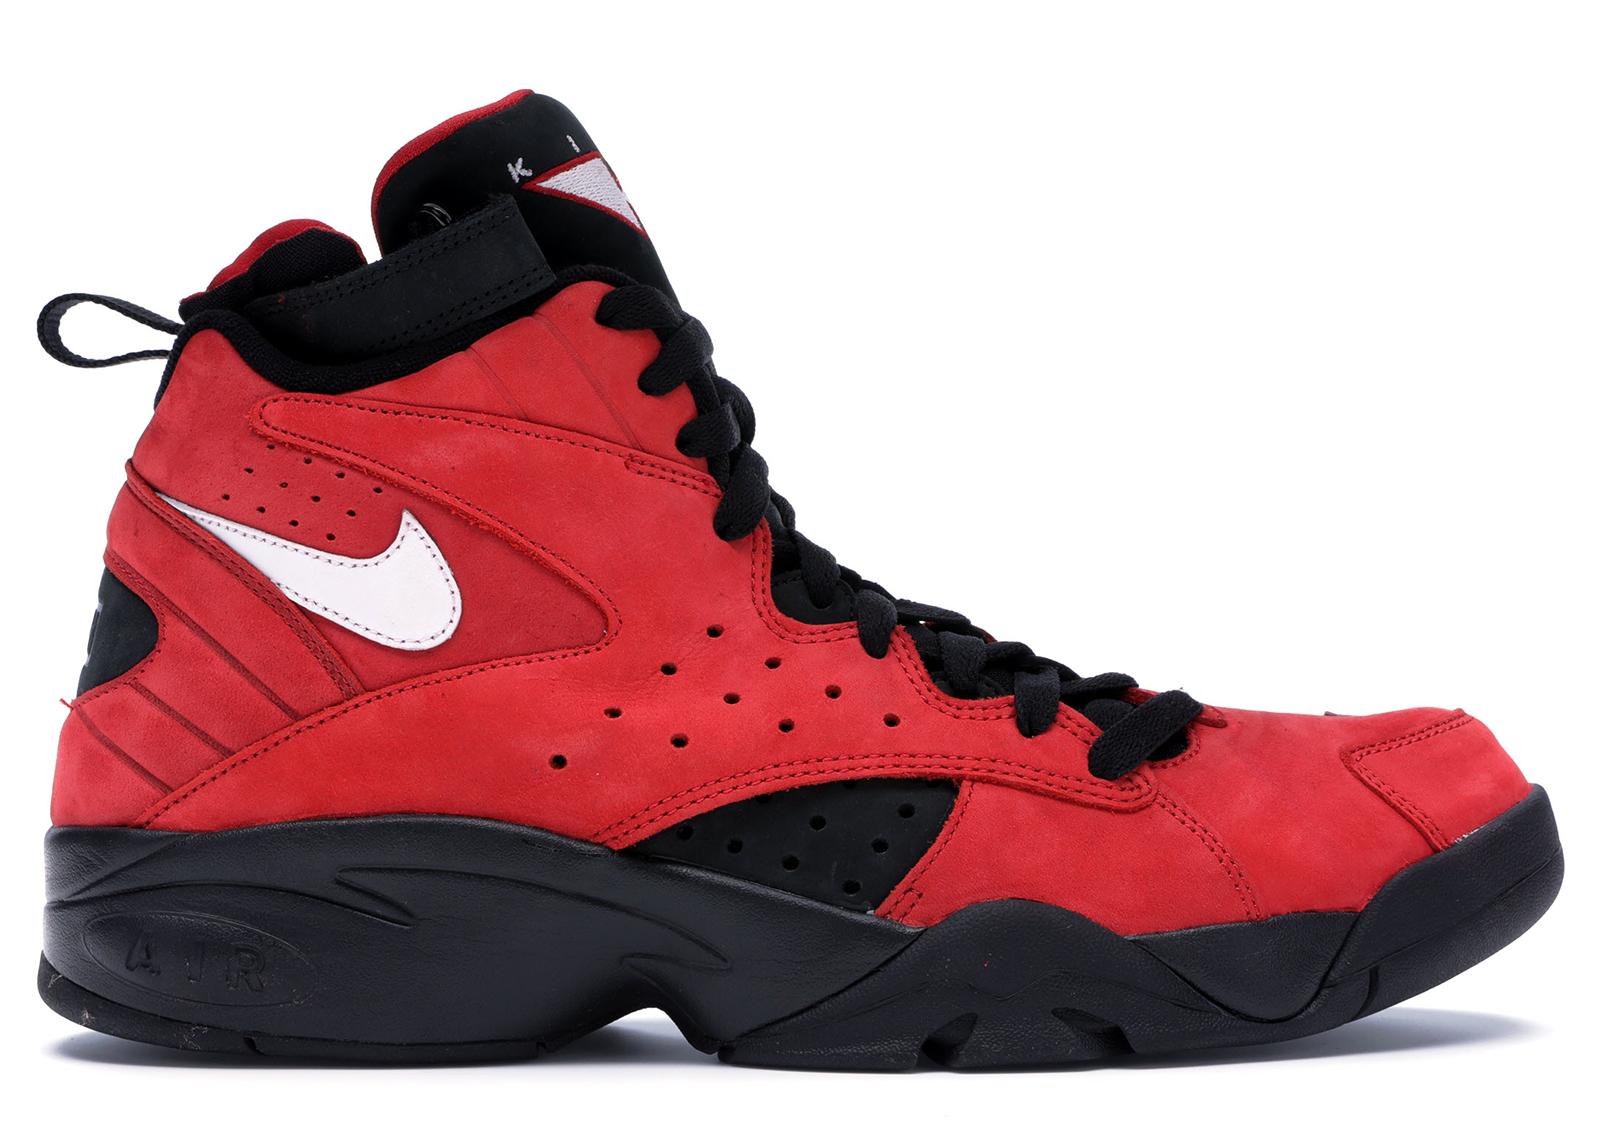 Nike Air Maestro 2 High Kith Red